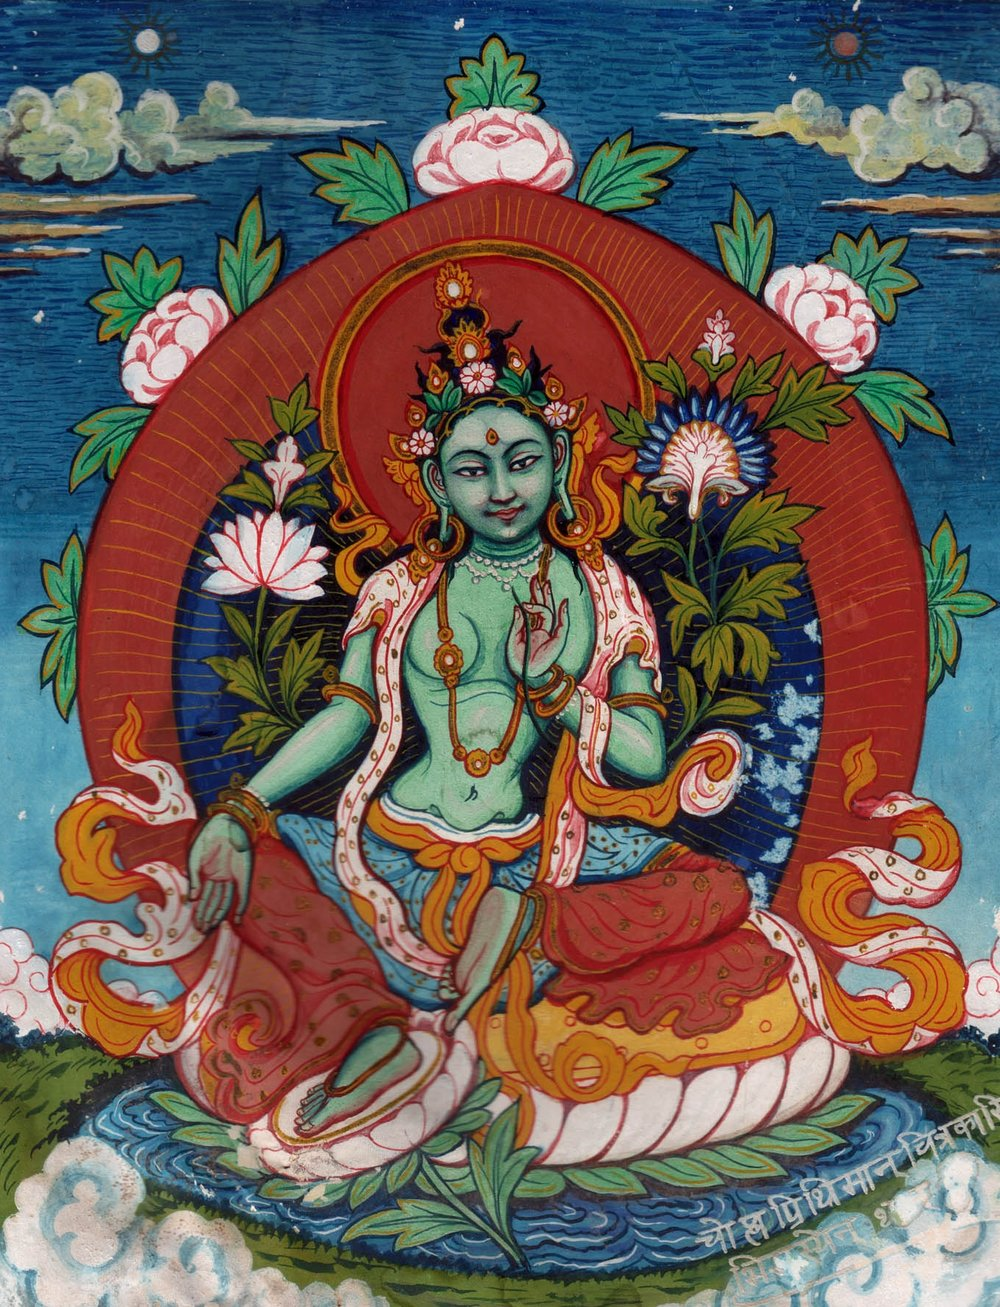 Green Tara from the Tibetan Mythology